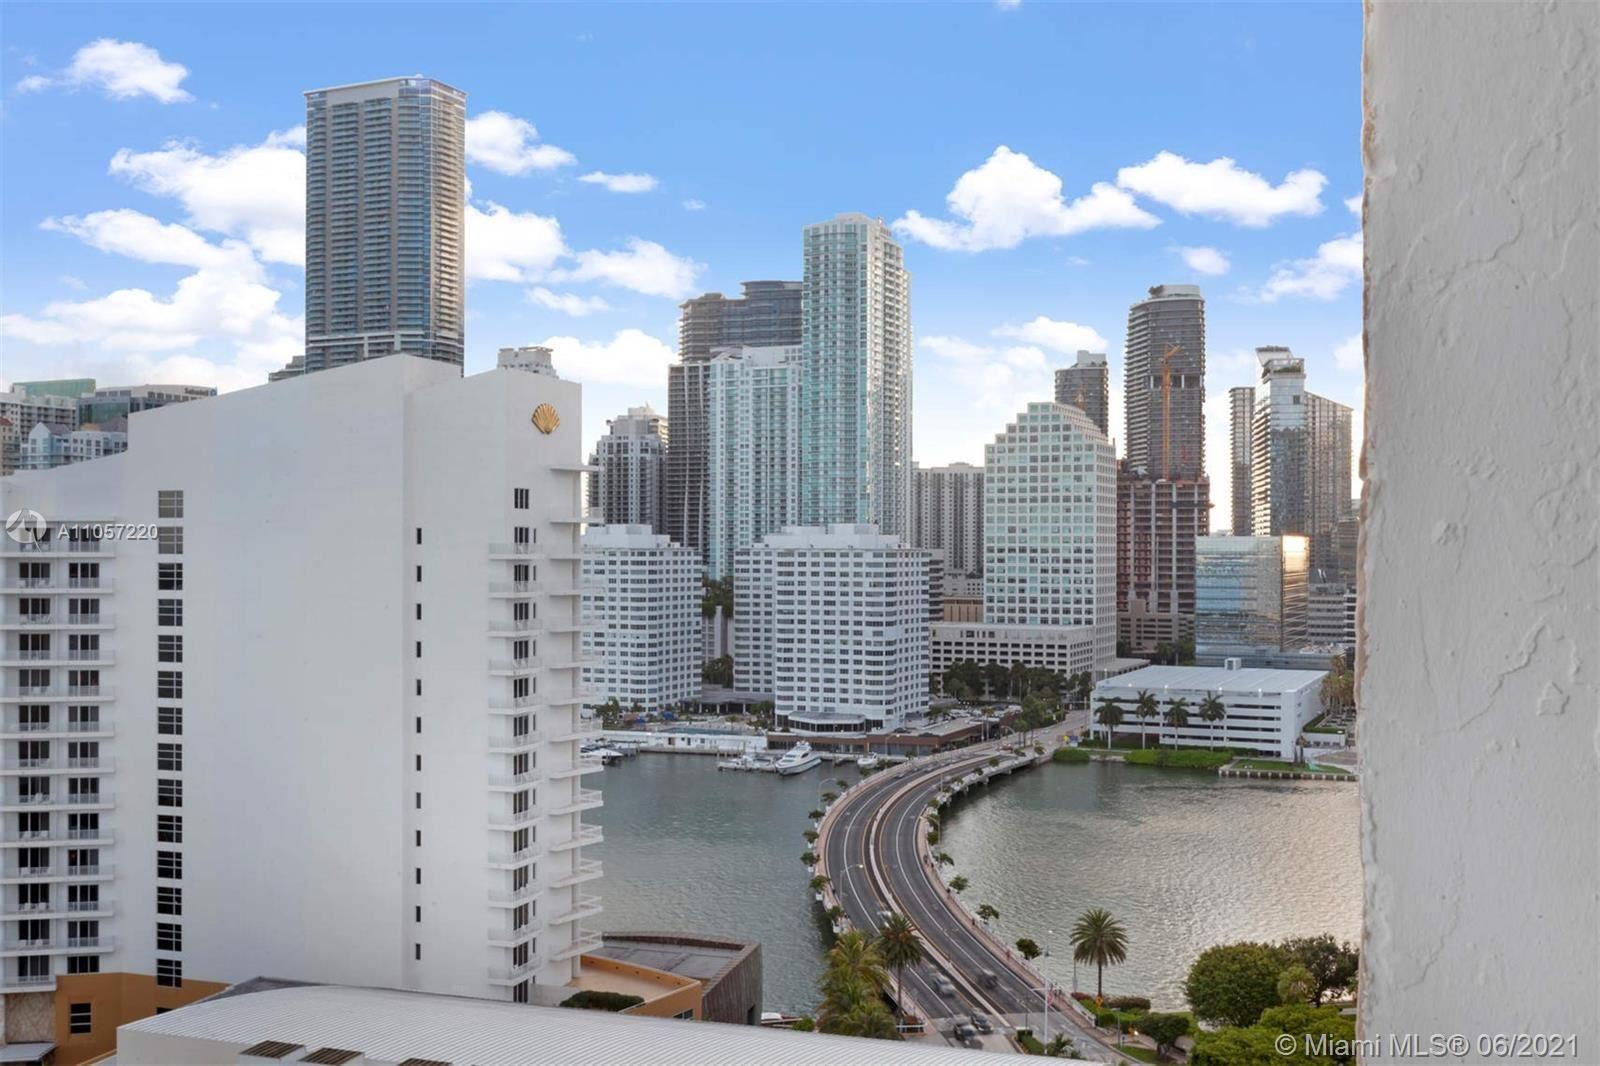 770 Claughton Island Dr #PH-12, Miami, FL 33131 - #: A11057220